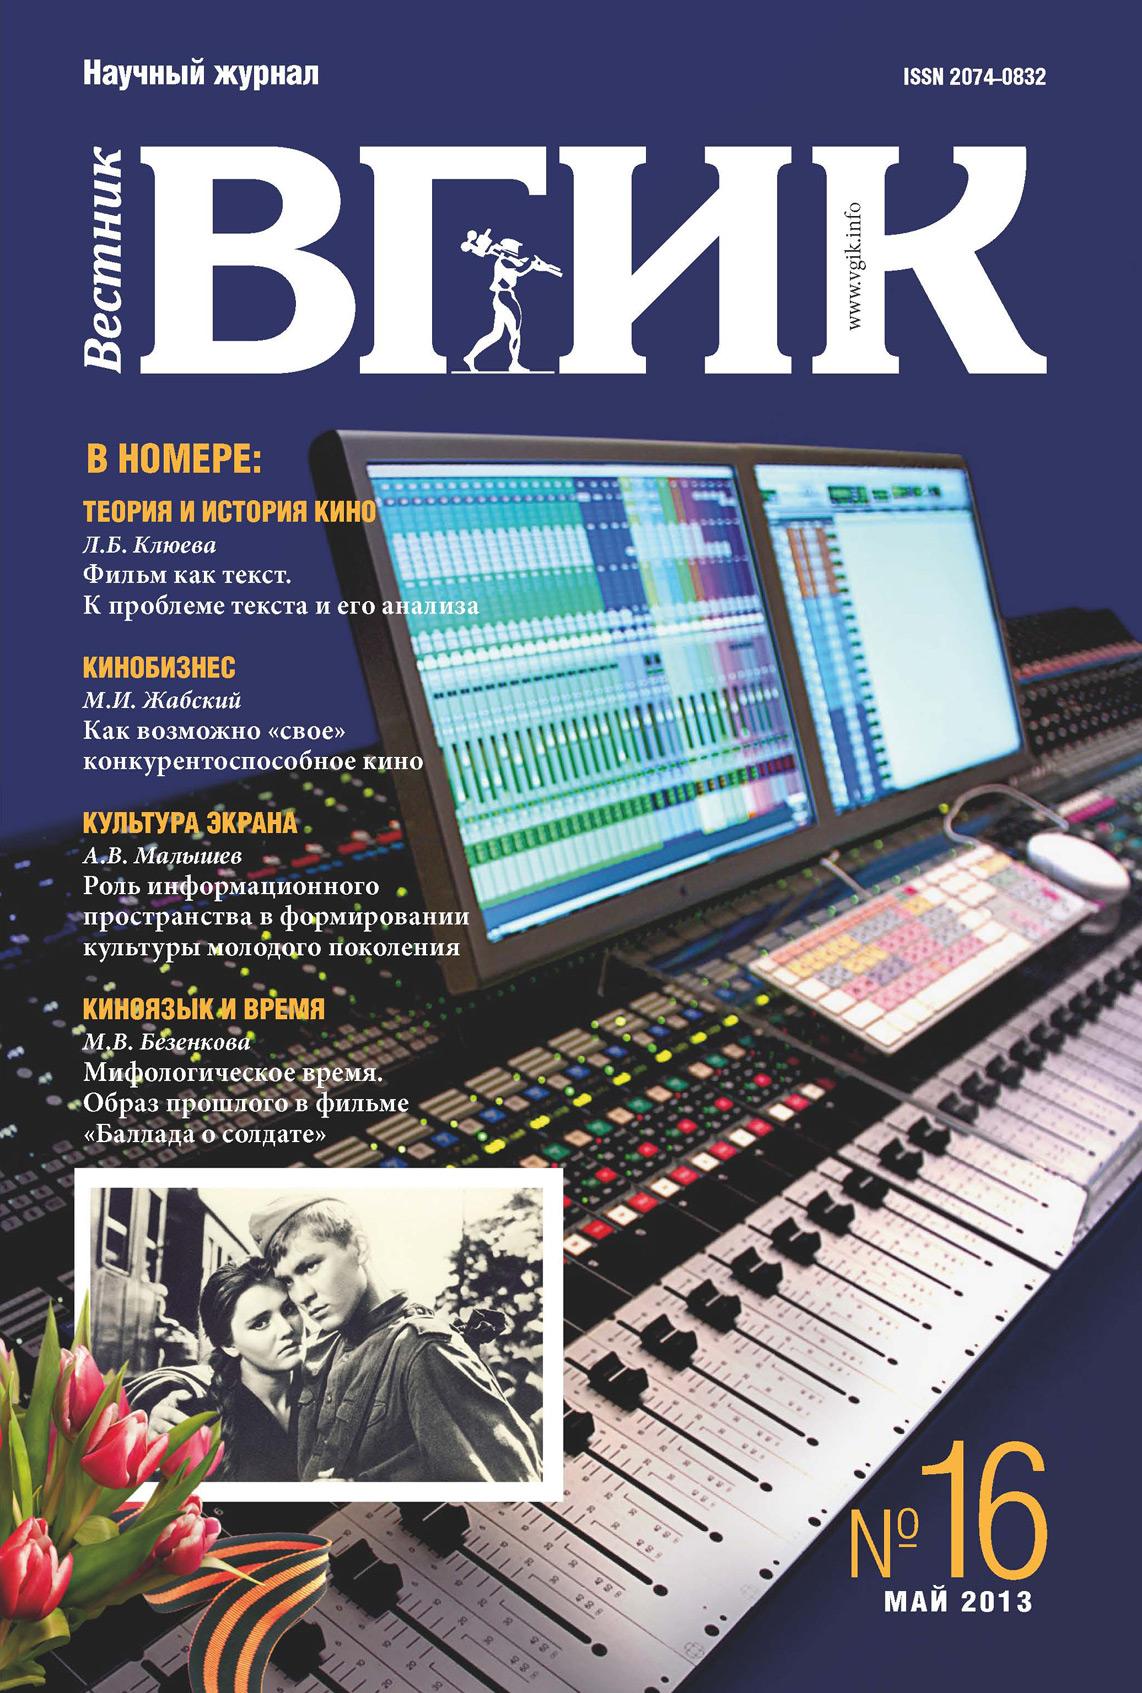 Вестник ВГИК № 16 май 2013